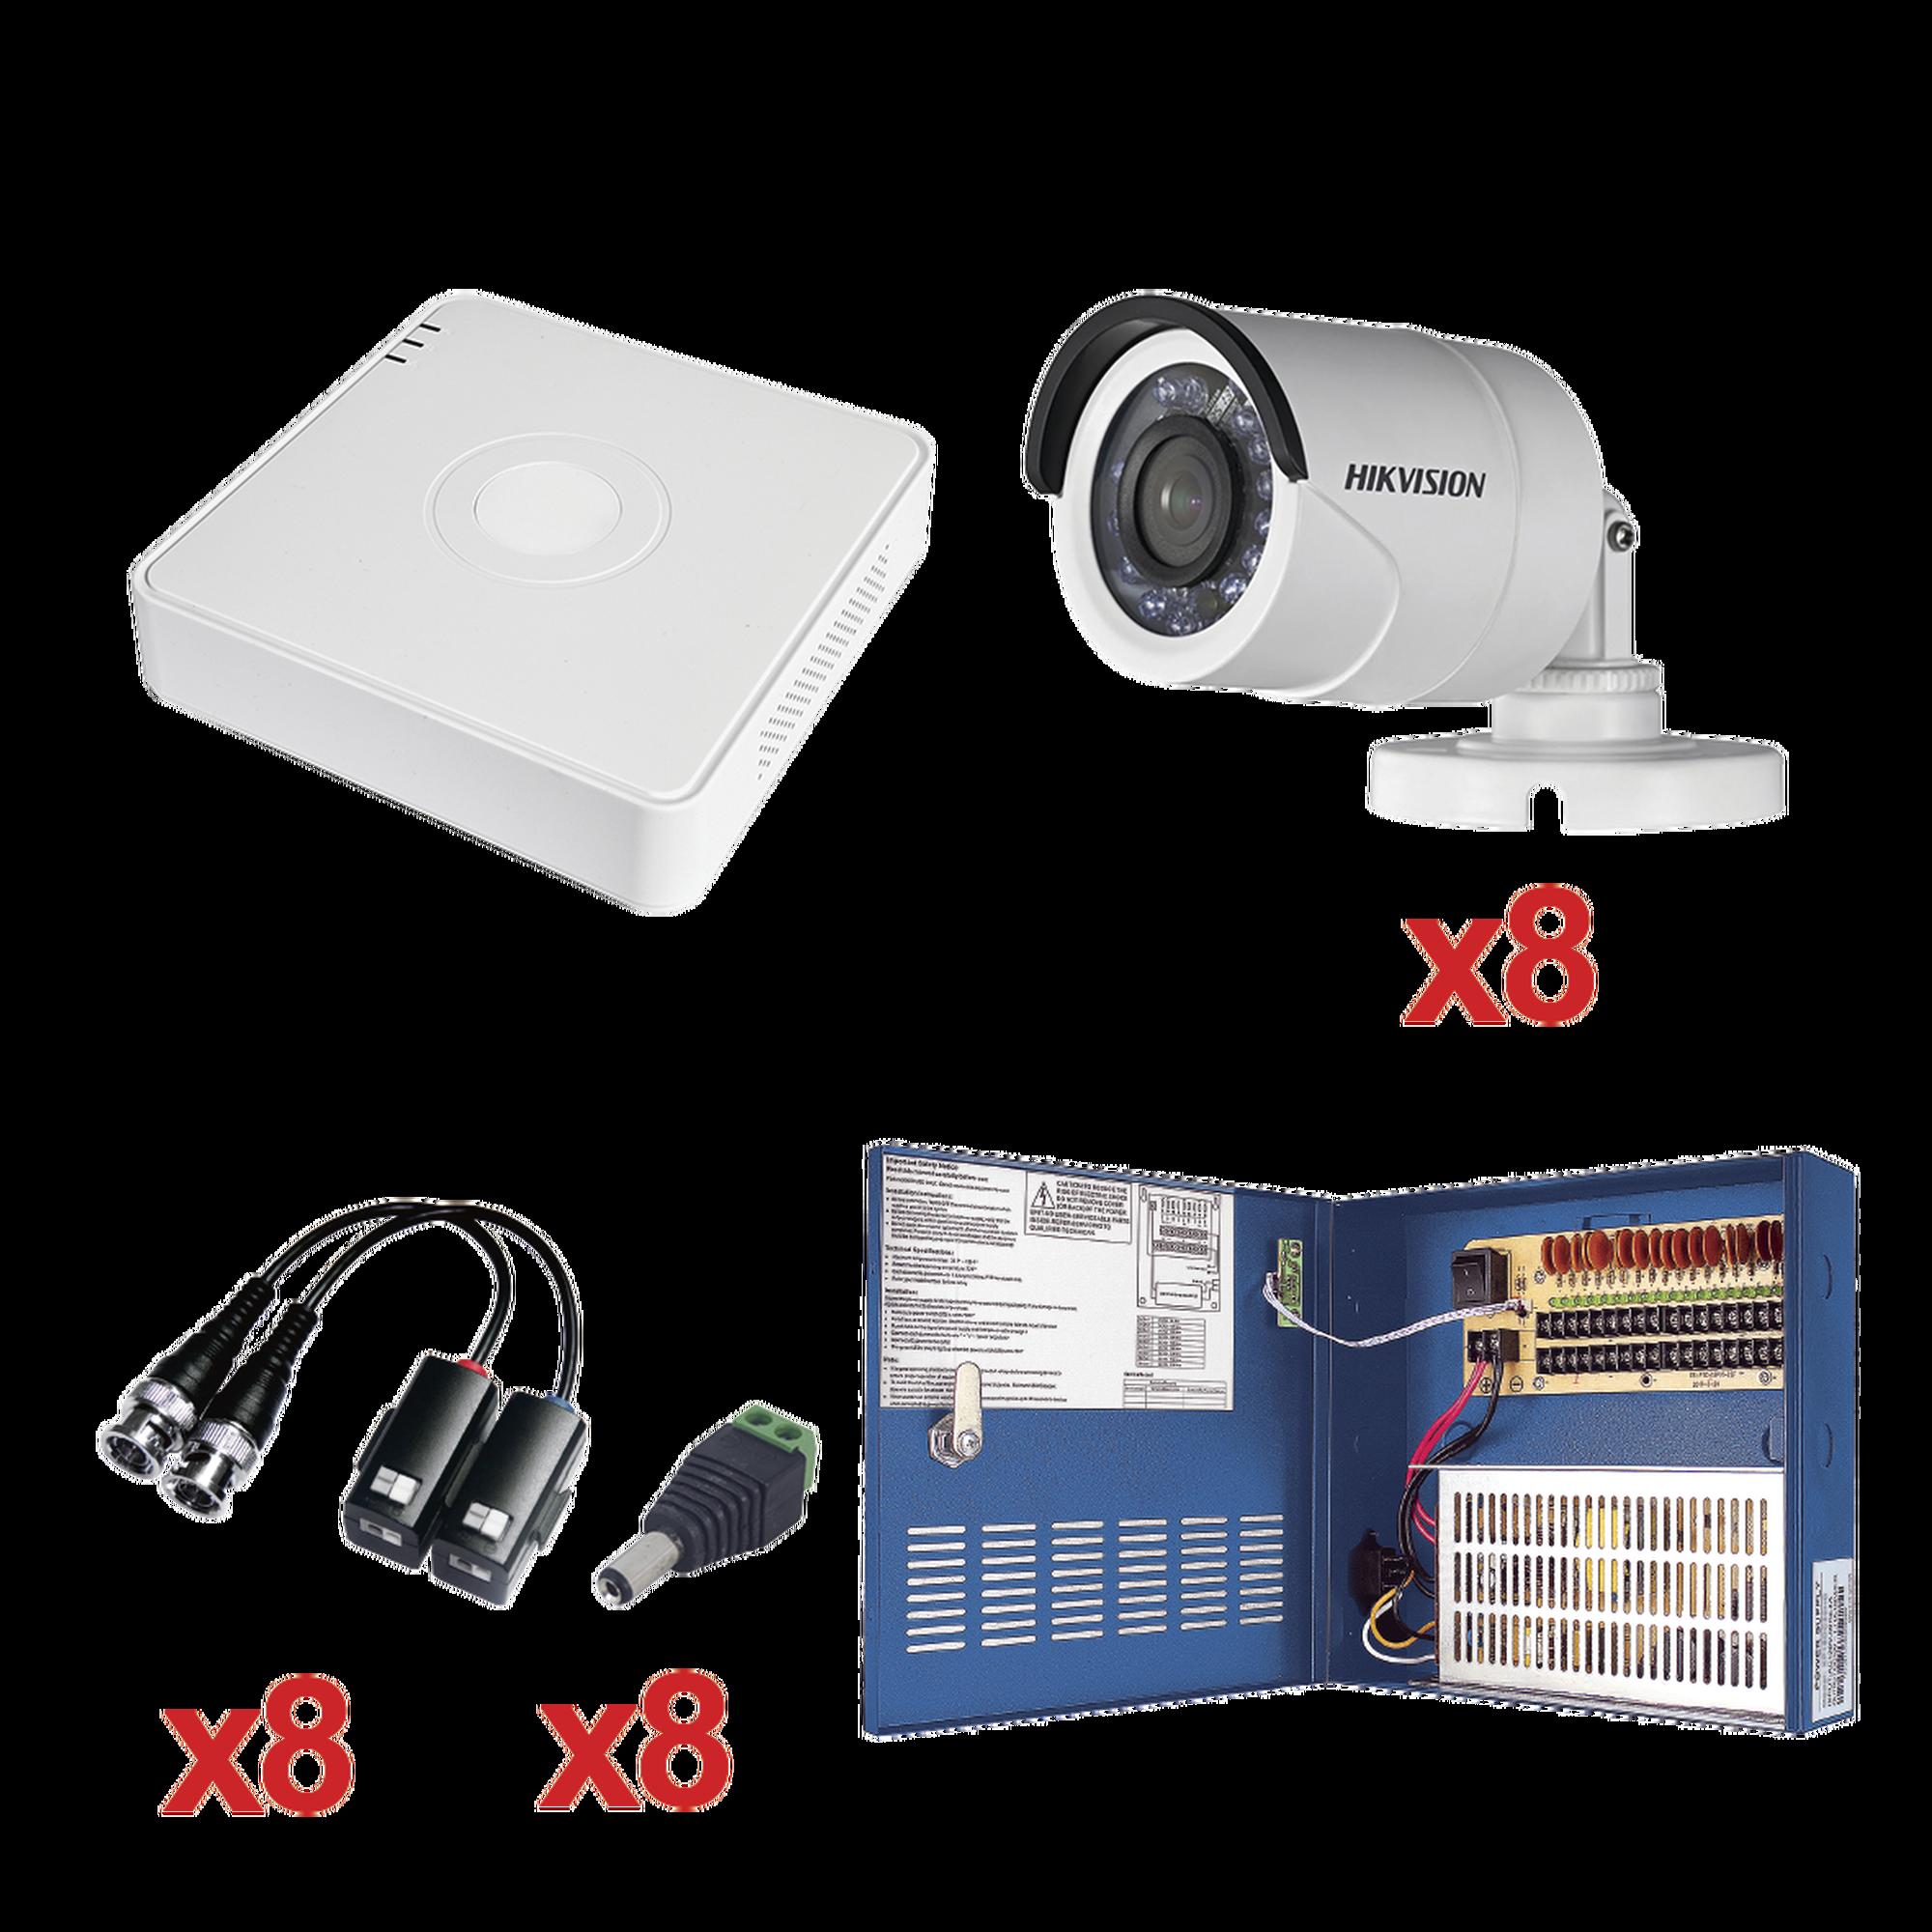 Sistema HIKVISION TURBOHD 720p / DVR 8 Canales / 8 Cámaras Bullet 3.6 mm / Transceptores / Conectores / Fuente de Poder Profesional hasta 15 Vcd para Larga Distancia